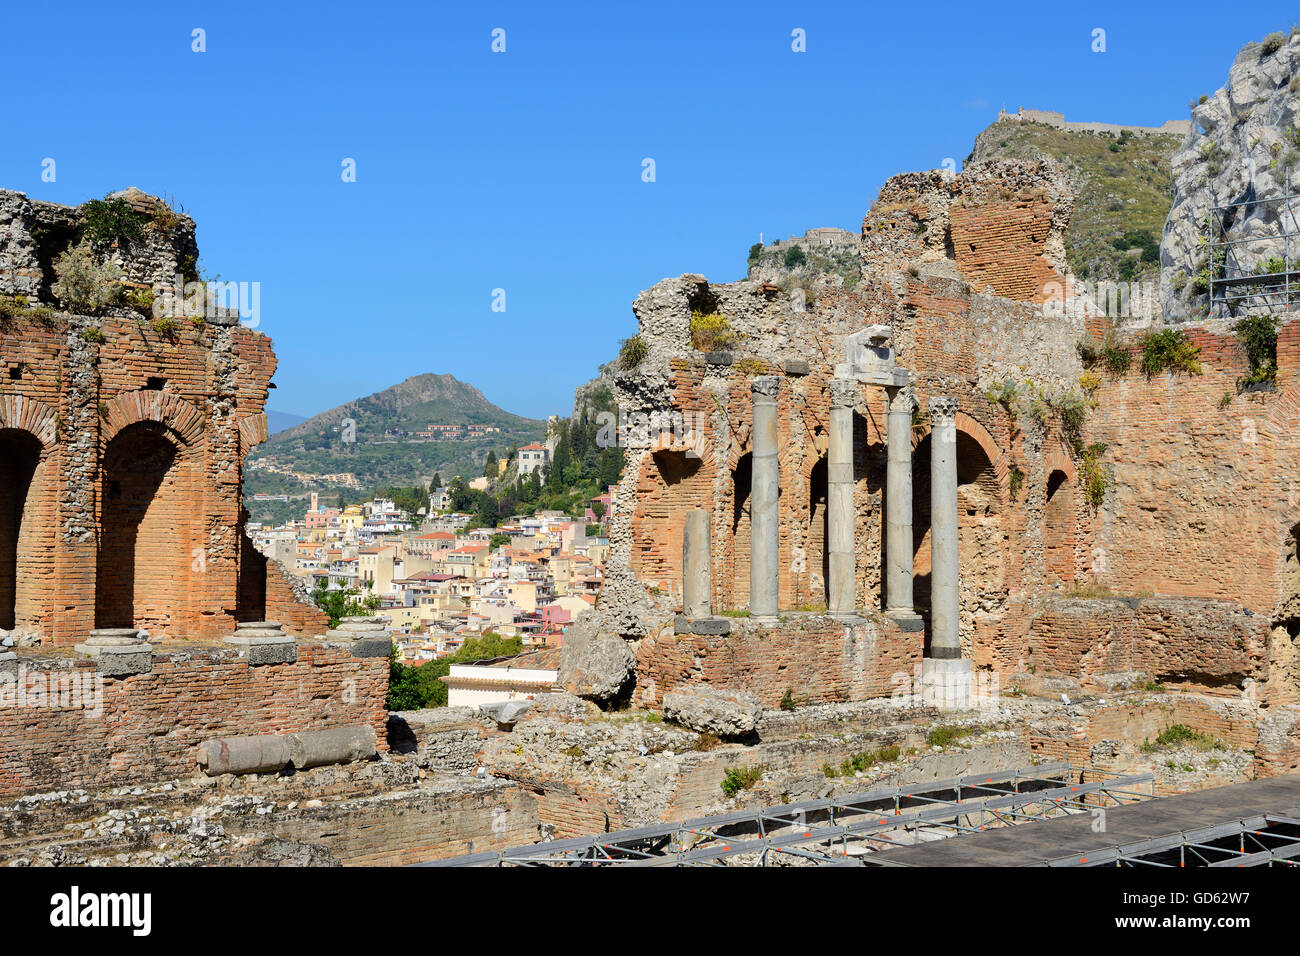 Théâtre grec - Taormina, Sicile, Italie Photo Stock